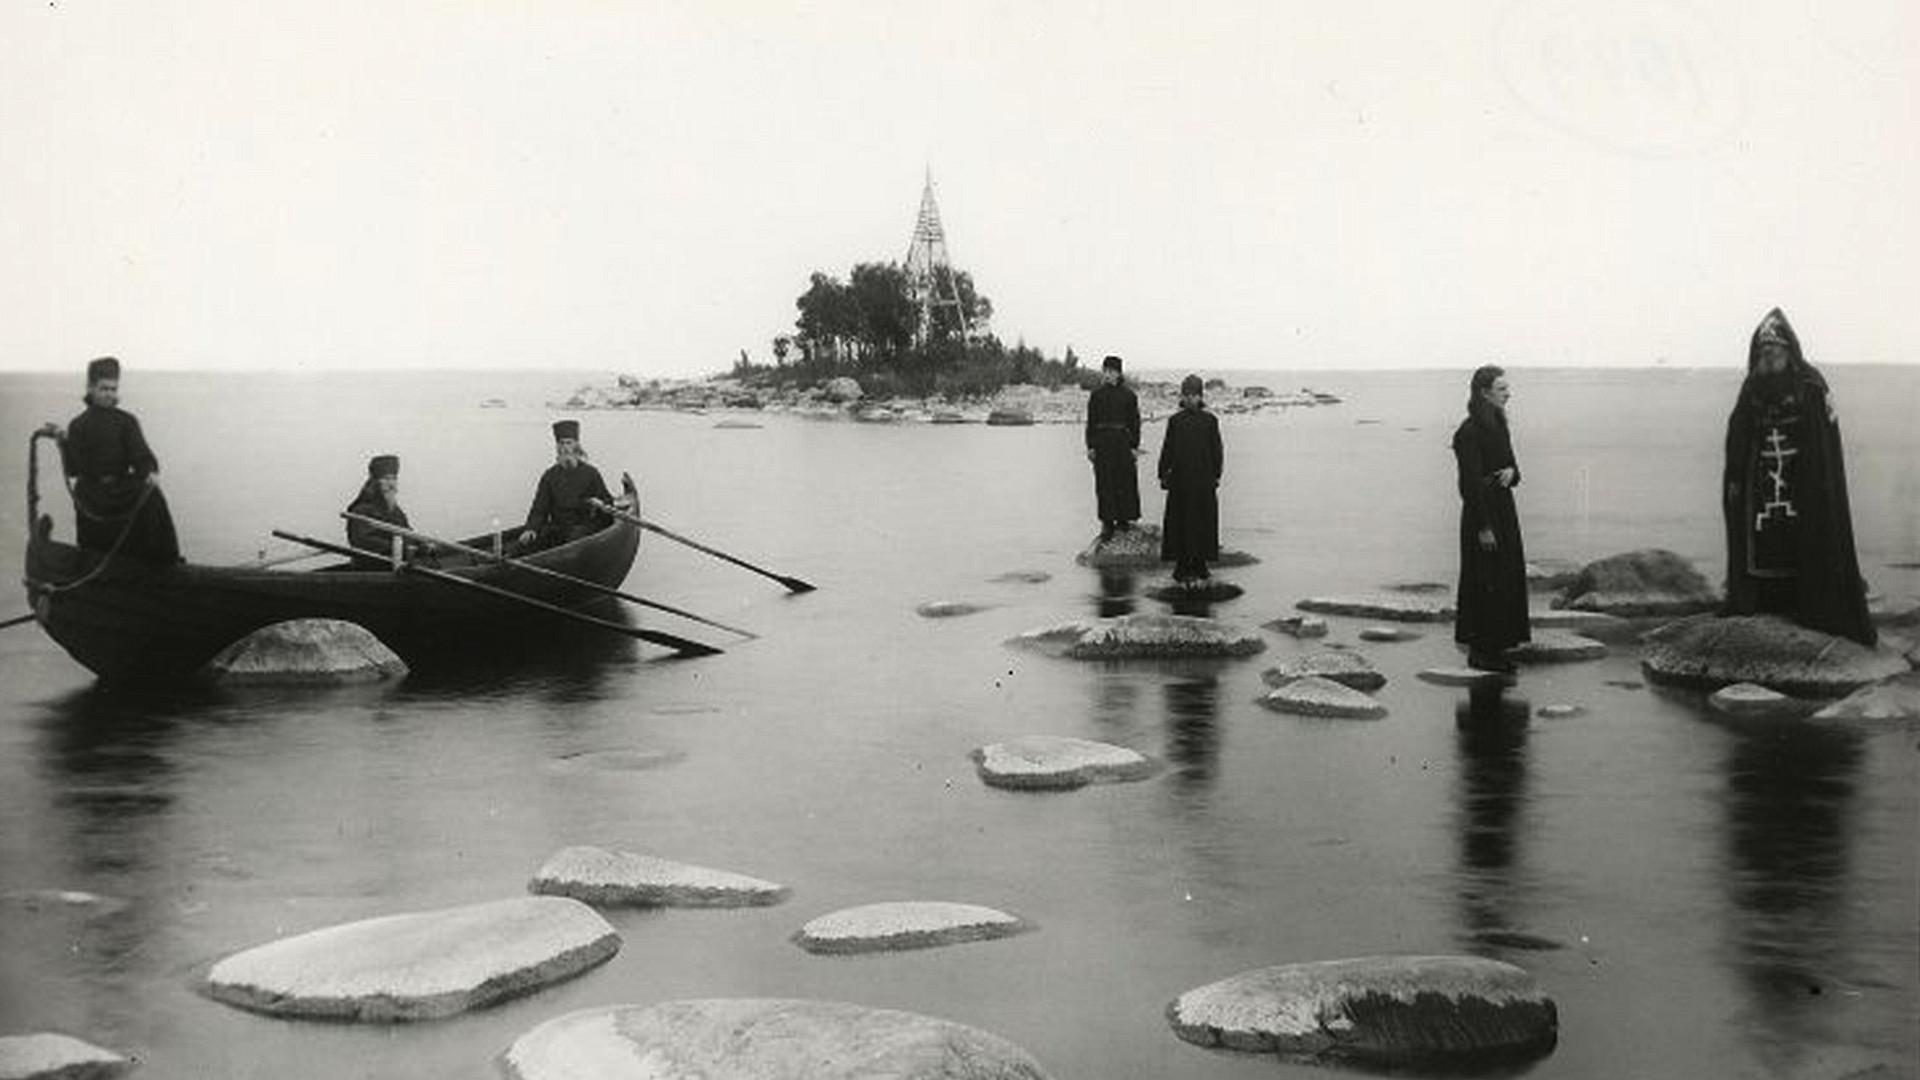 Monks on the lake. Konevsky monastery, 1895-1905